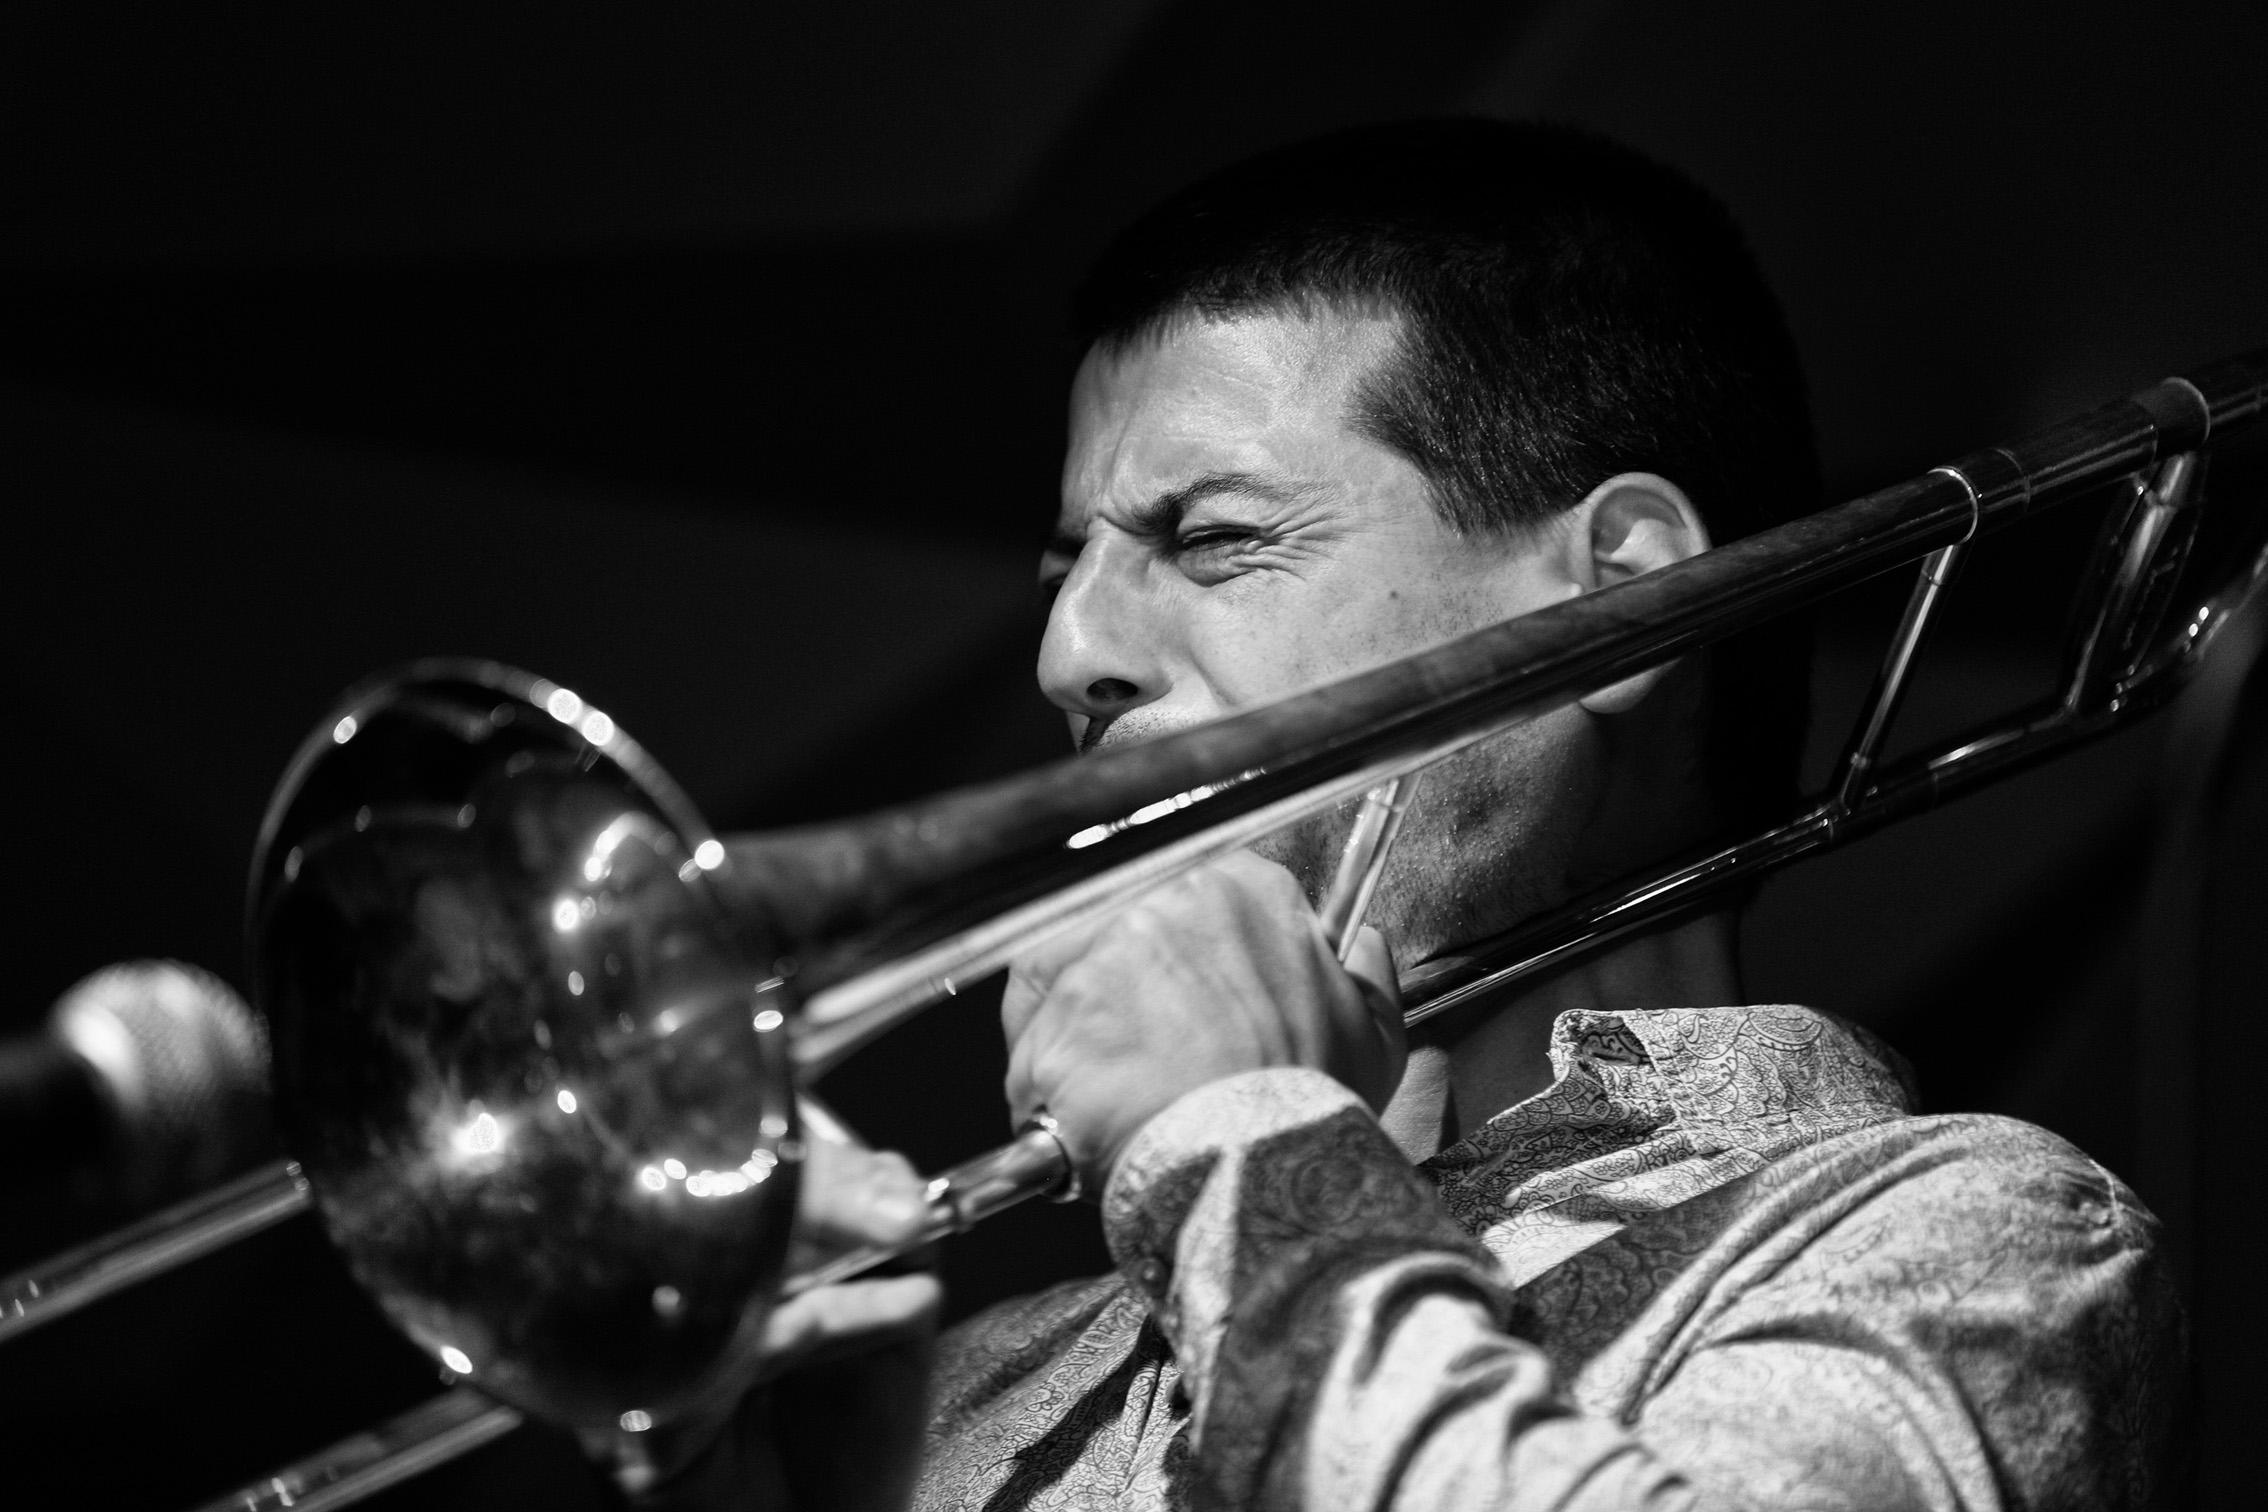 Víctor Correa